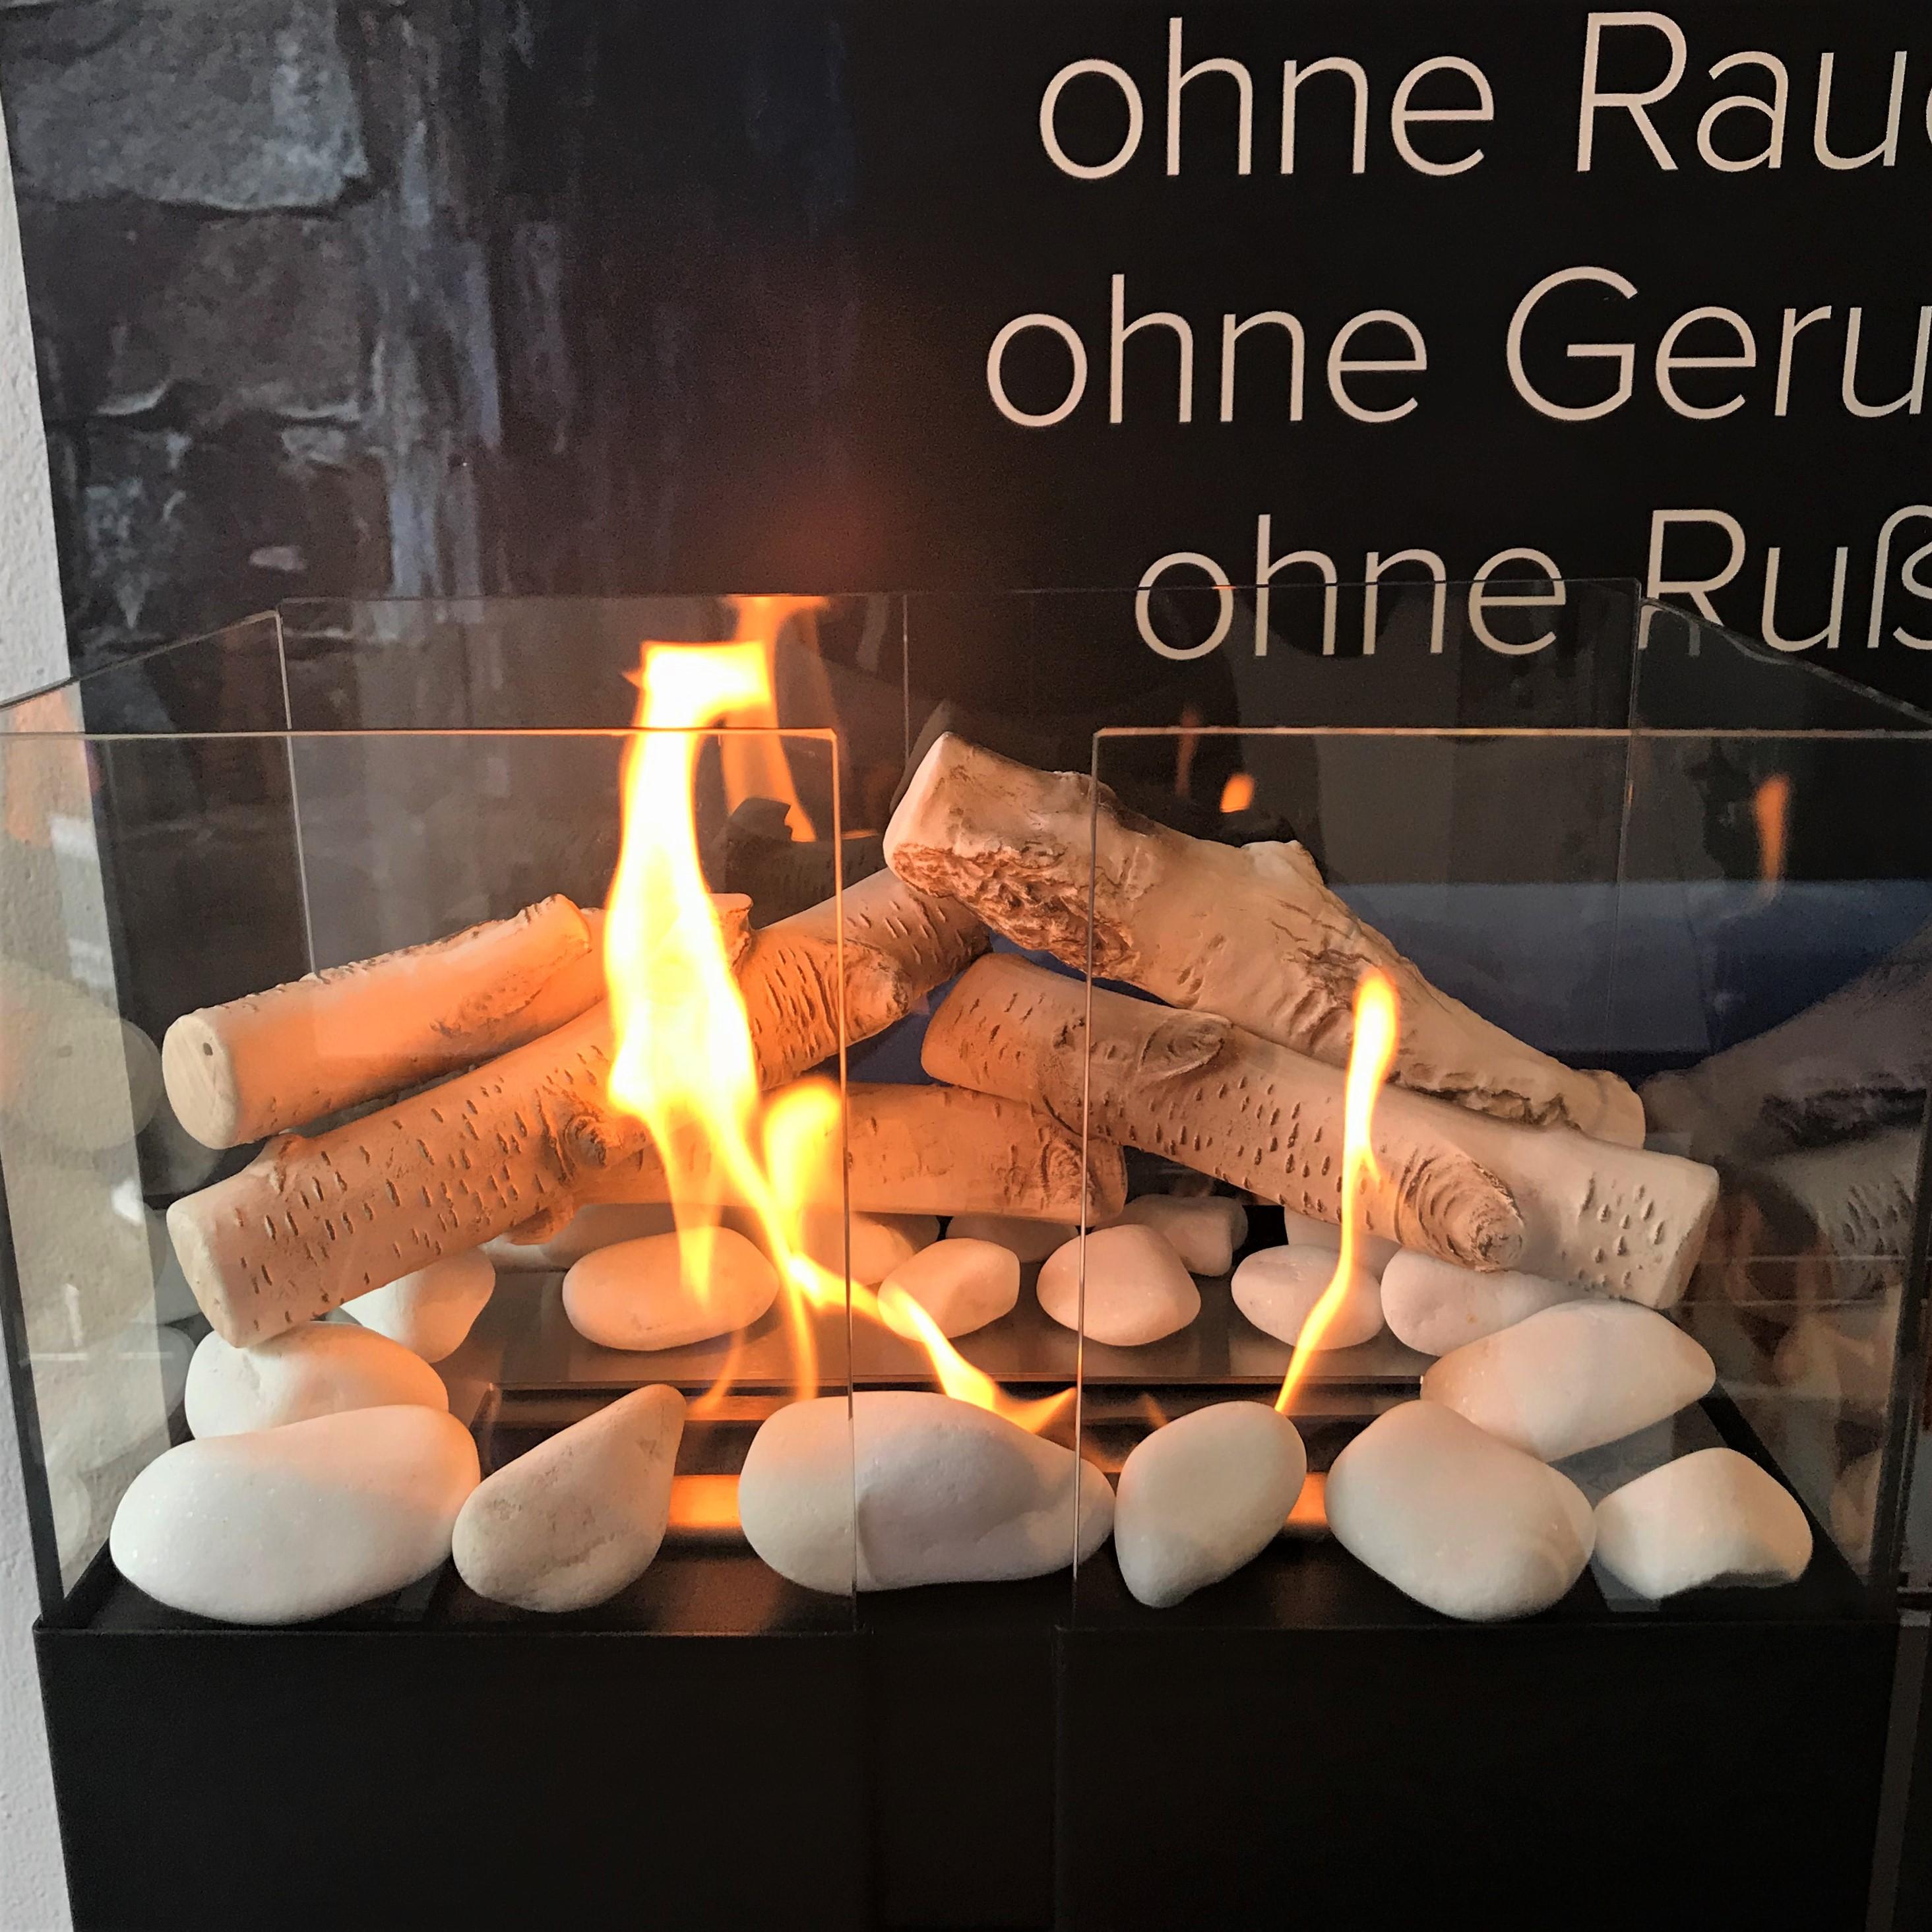 Tuv Gepruft Feuerstelle Biokamin Bioethanol Kamin Mit Deko Holz